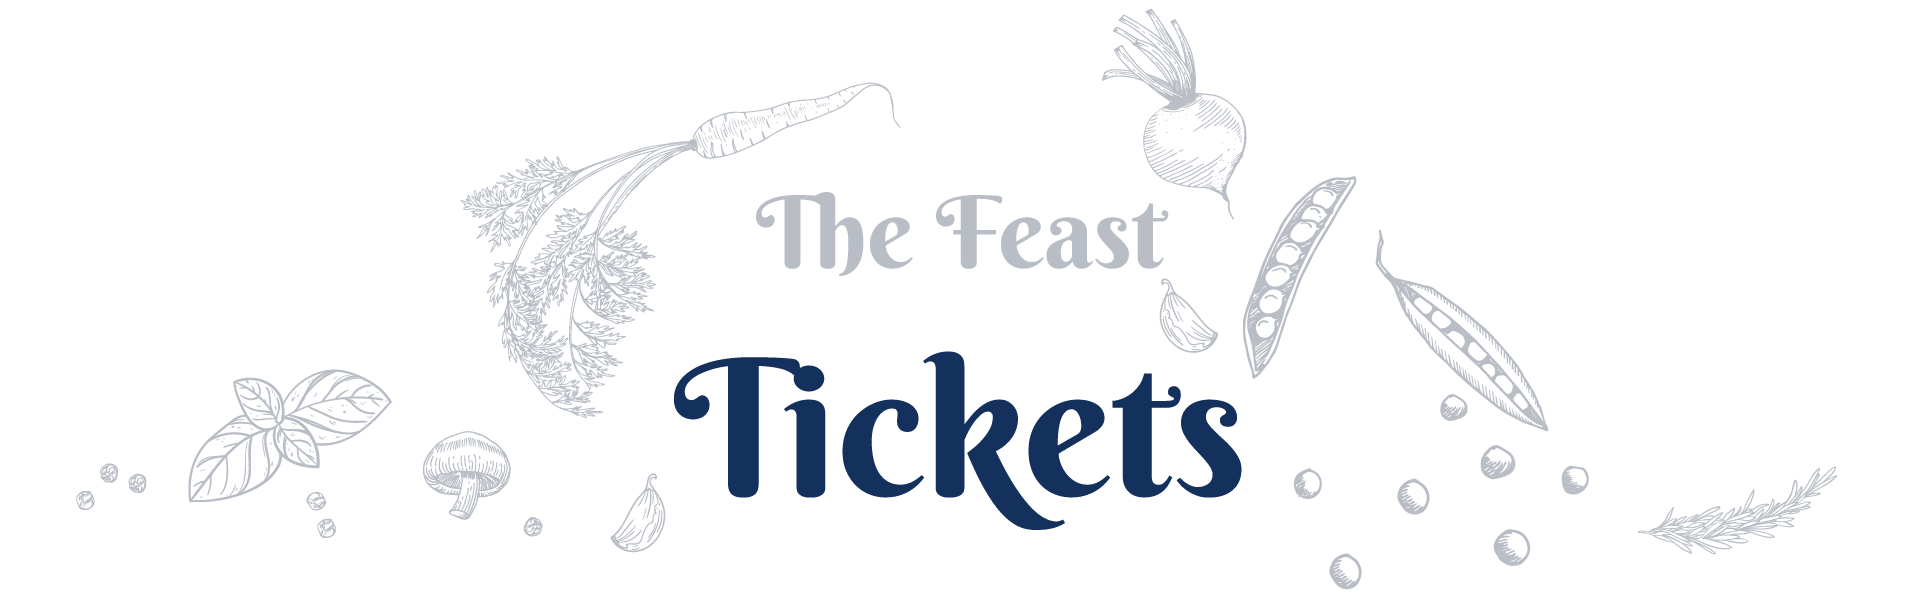 Feast_header_2_Tickets.png